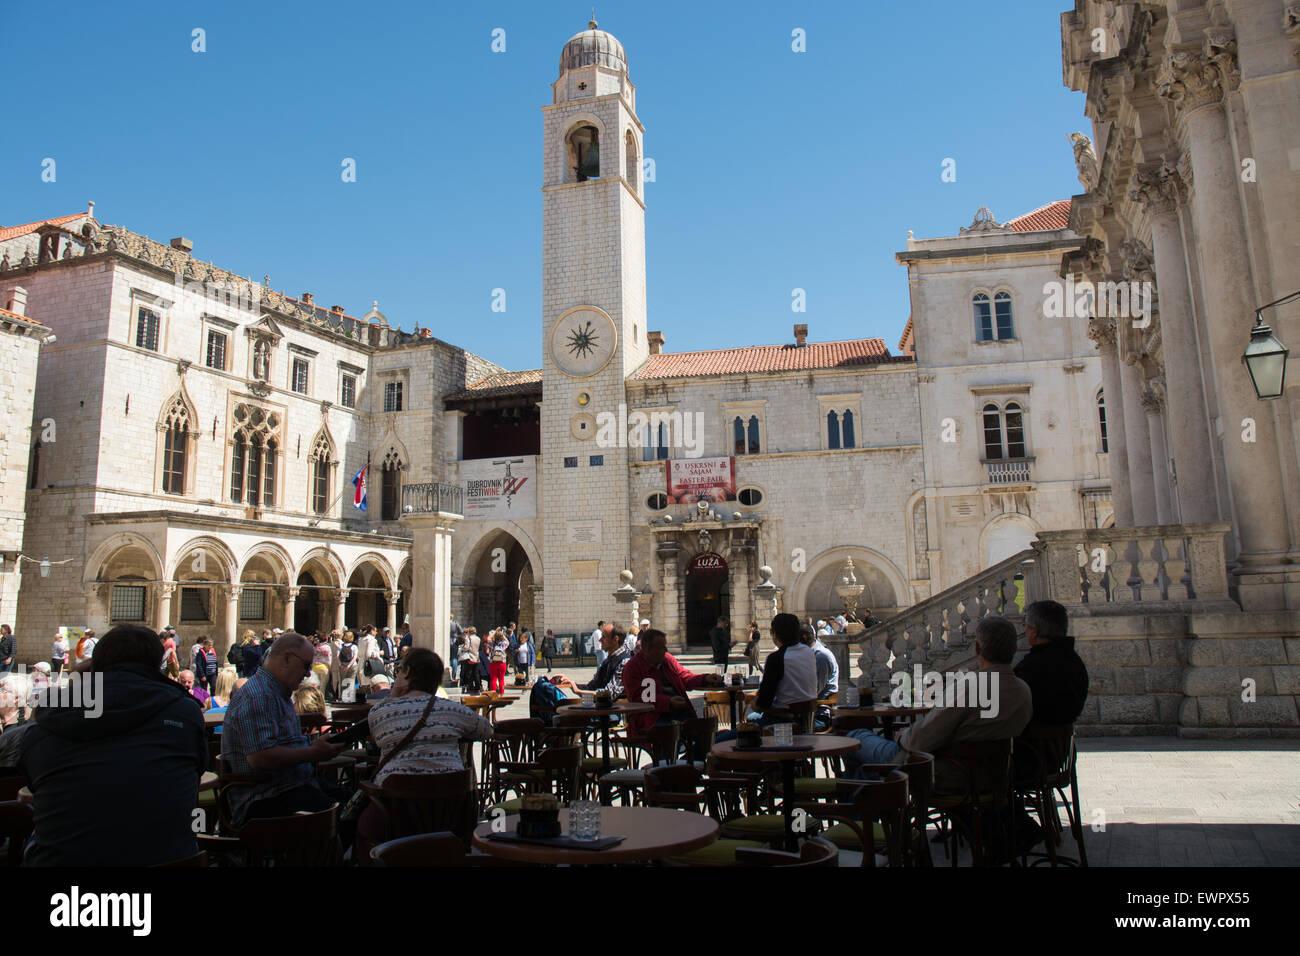 sponza palace & clock tower, luza square, old city dubrovnik, croatia - Stock Image